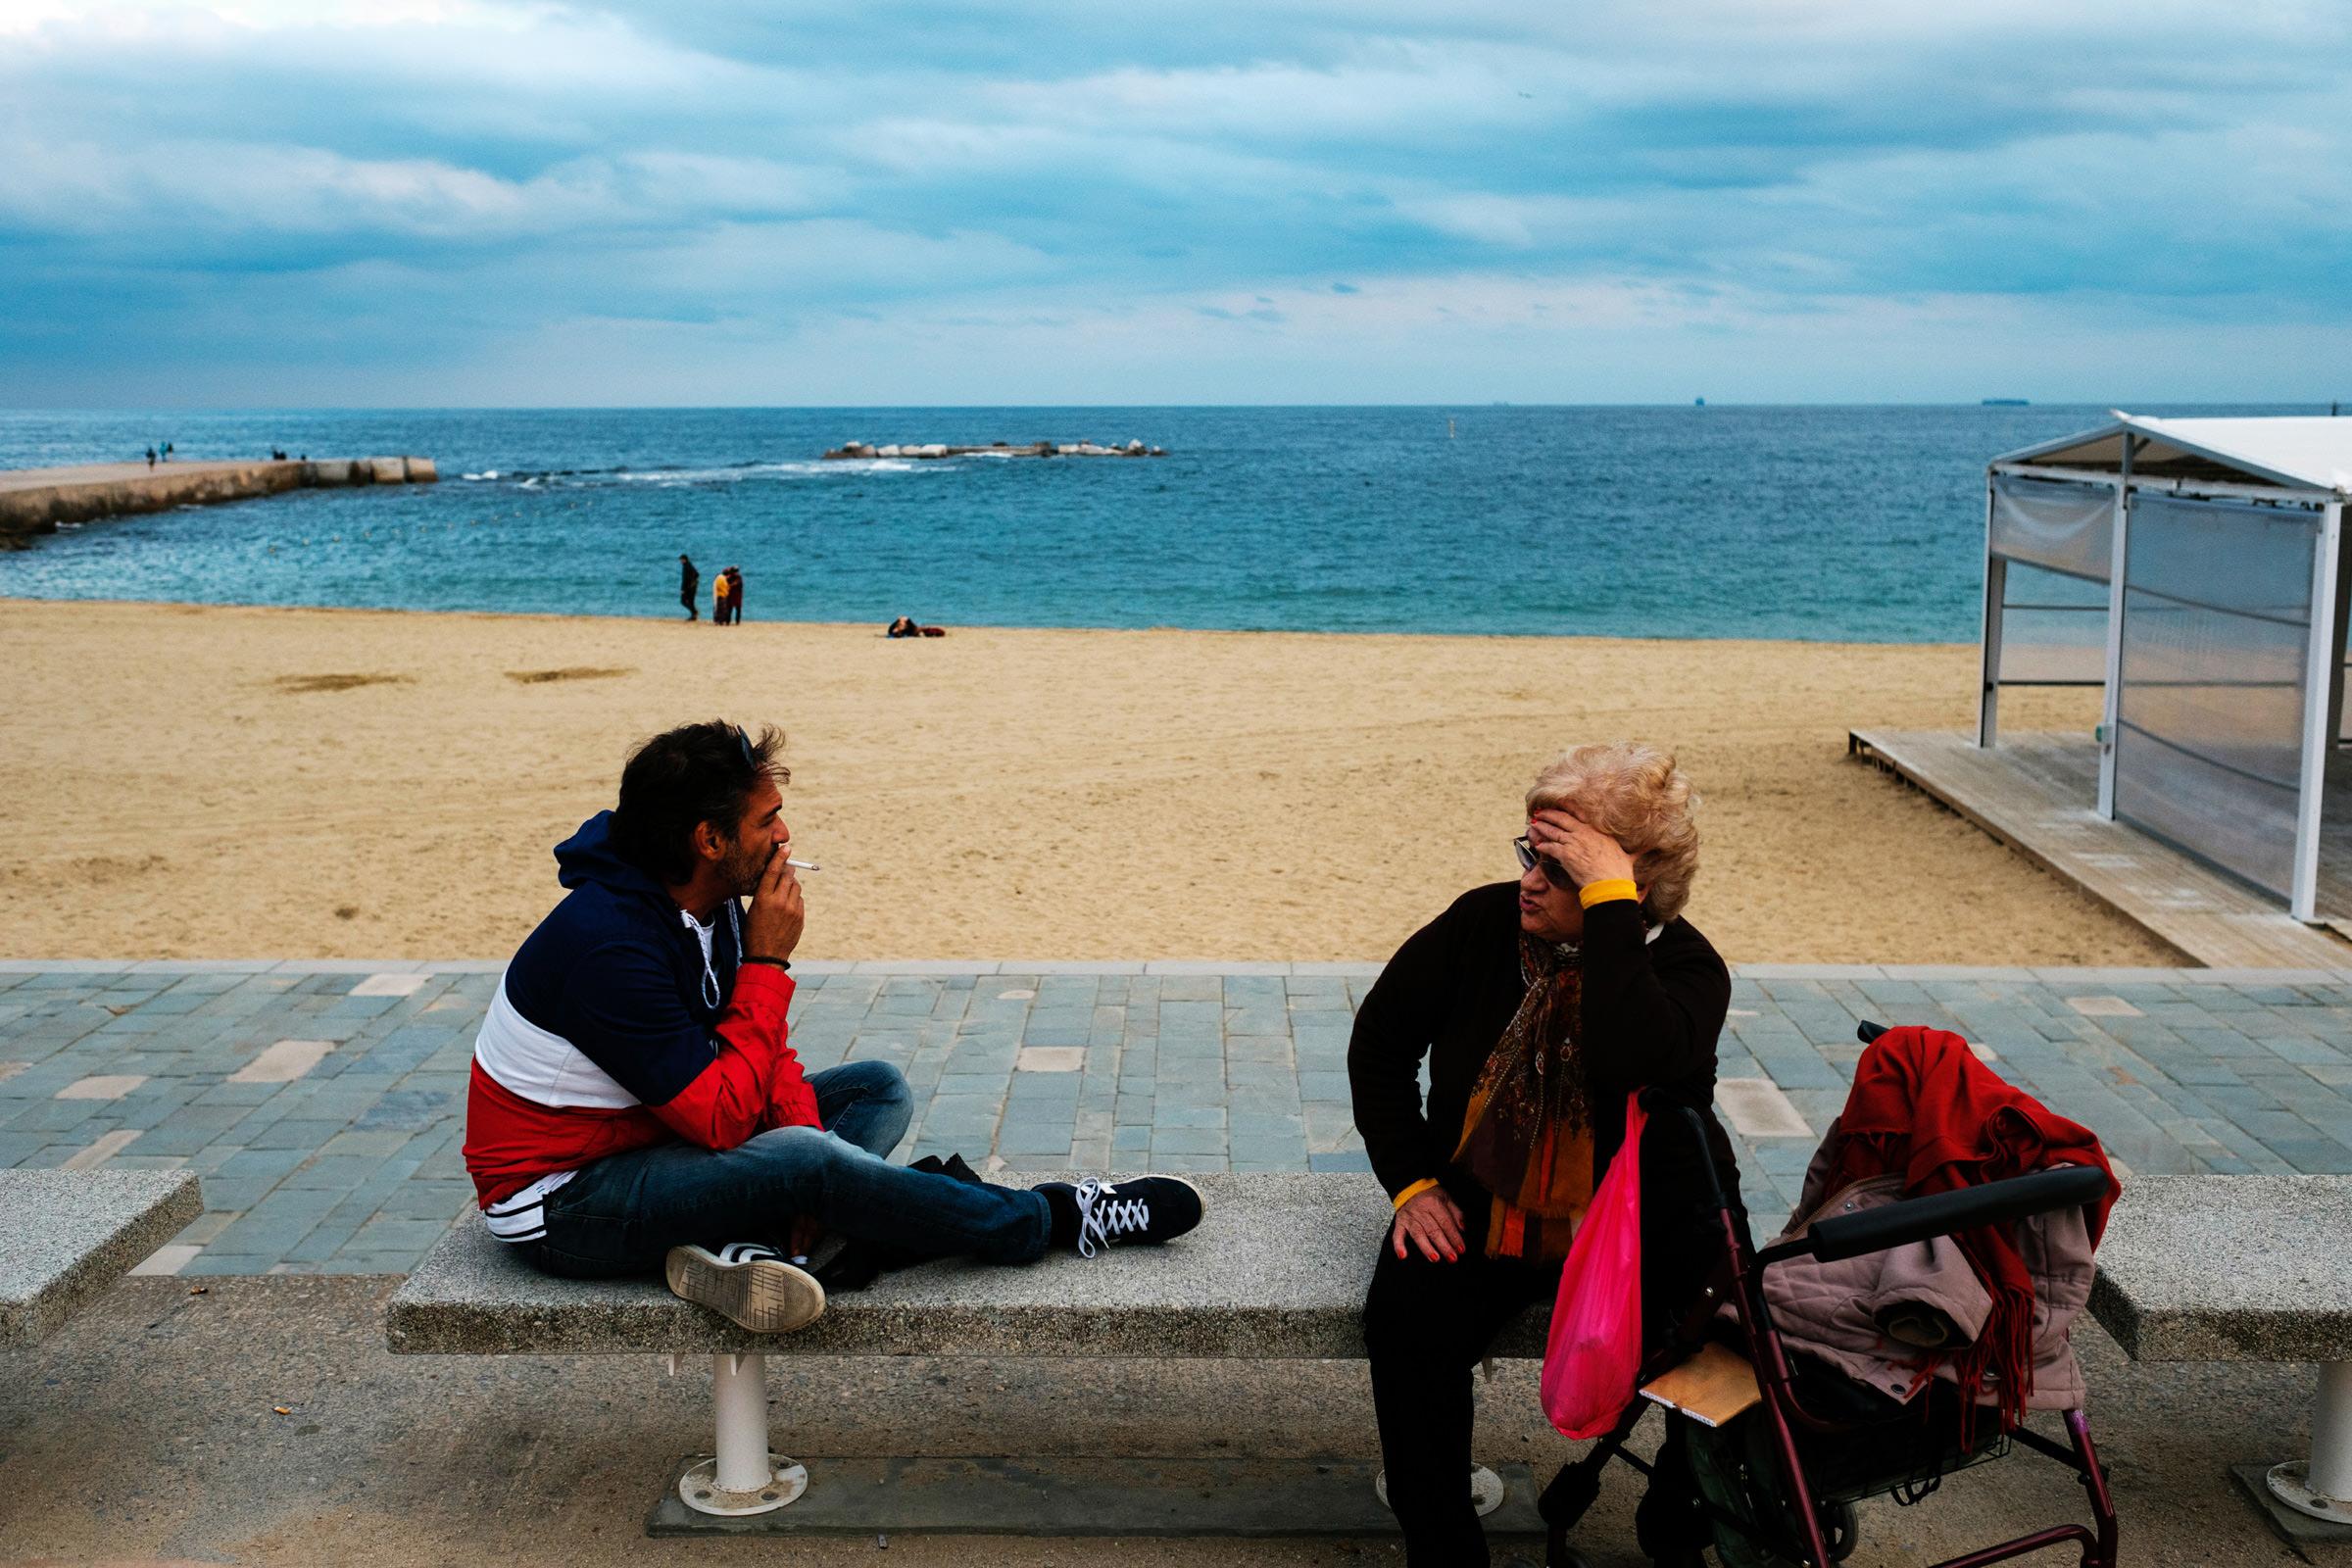 Spain-Street-Photography-13